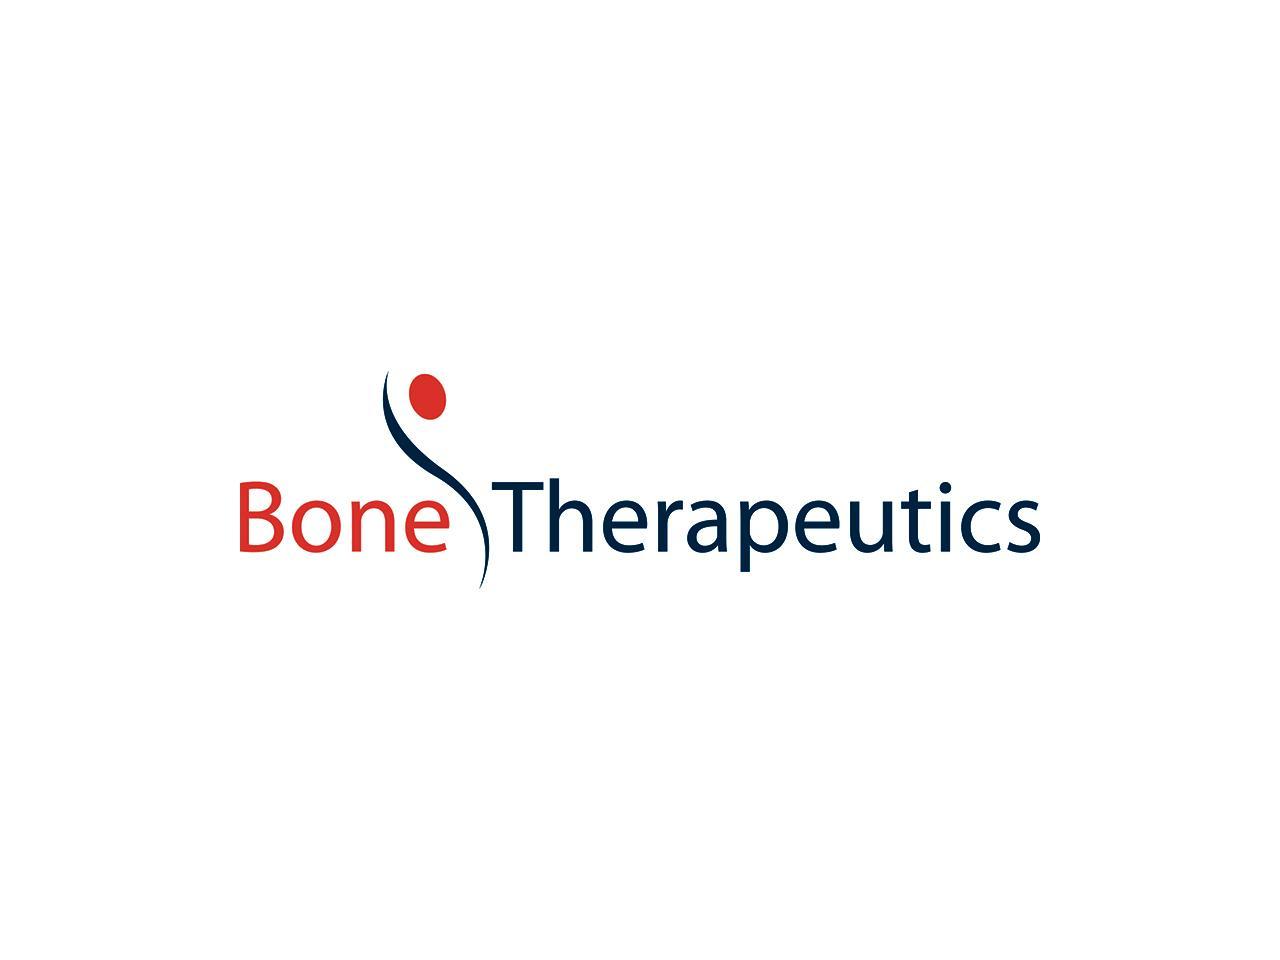 Bonetherapeutics logo